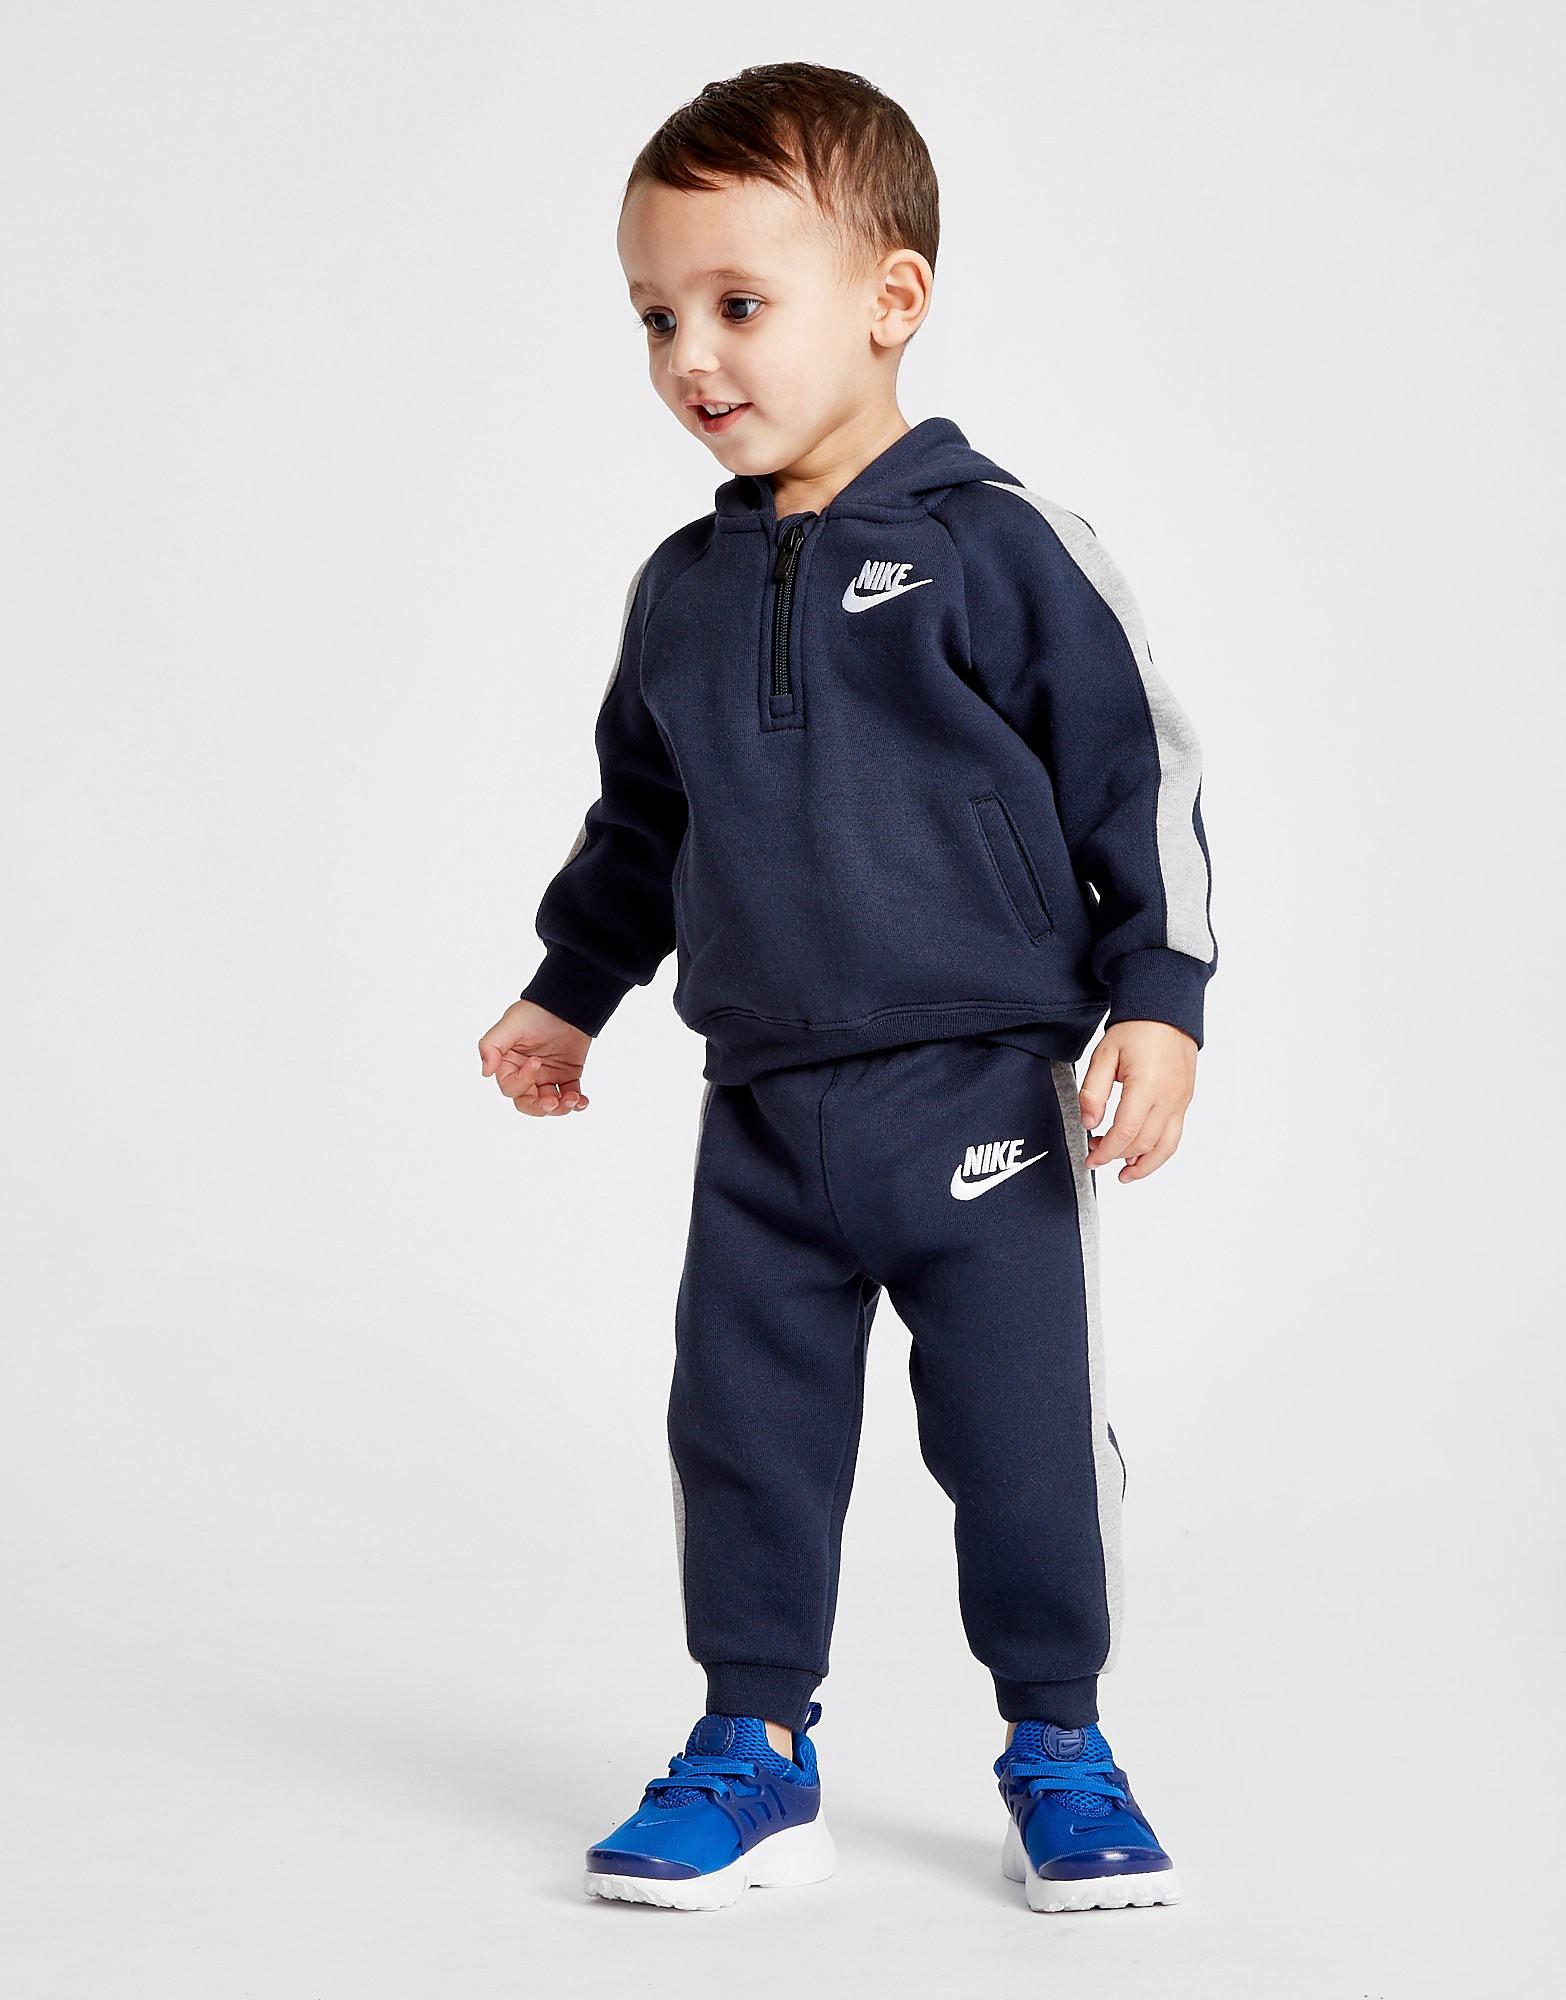 Nike Futura 1/4 Zip Suit Infant